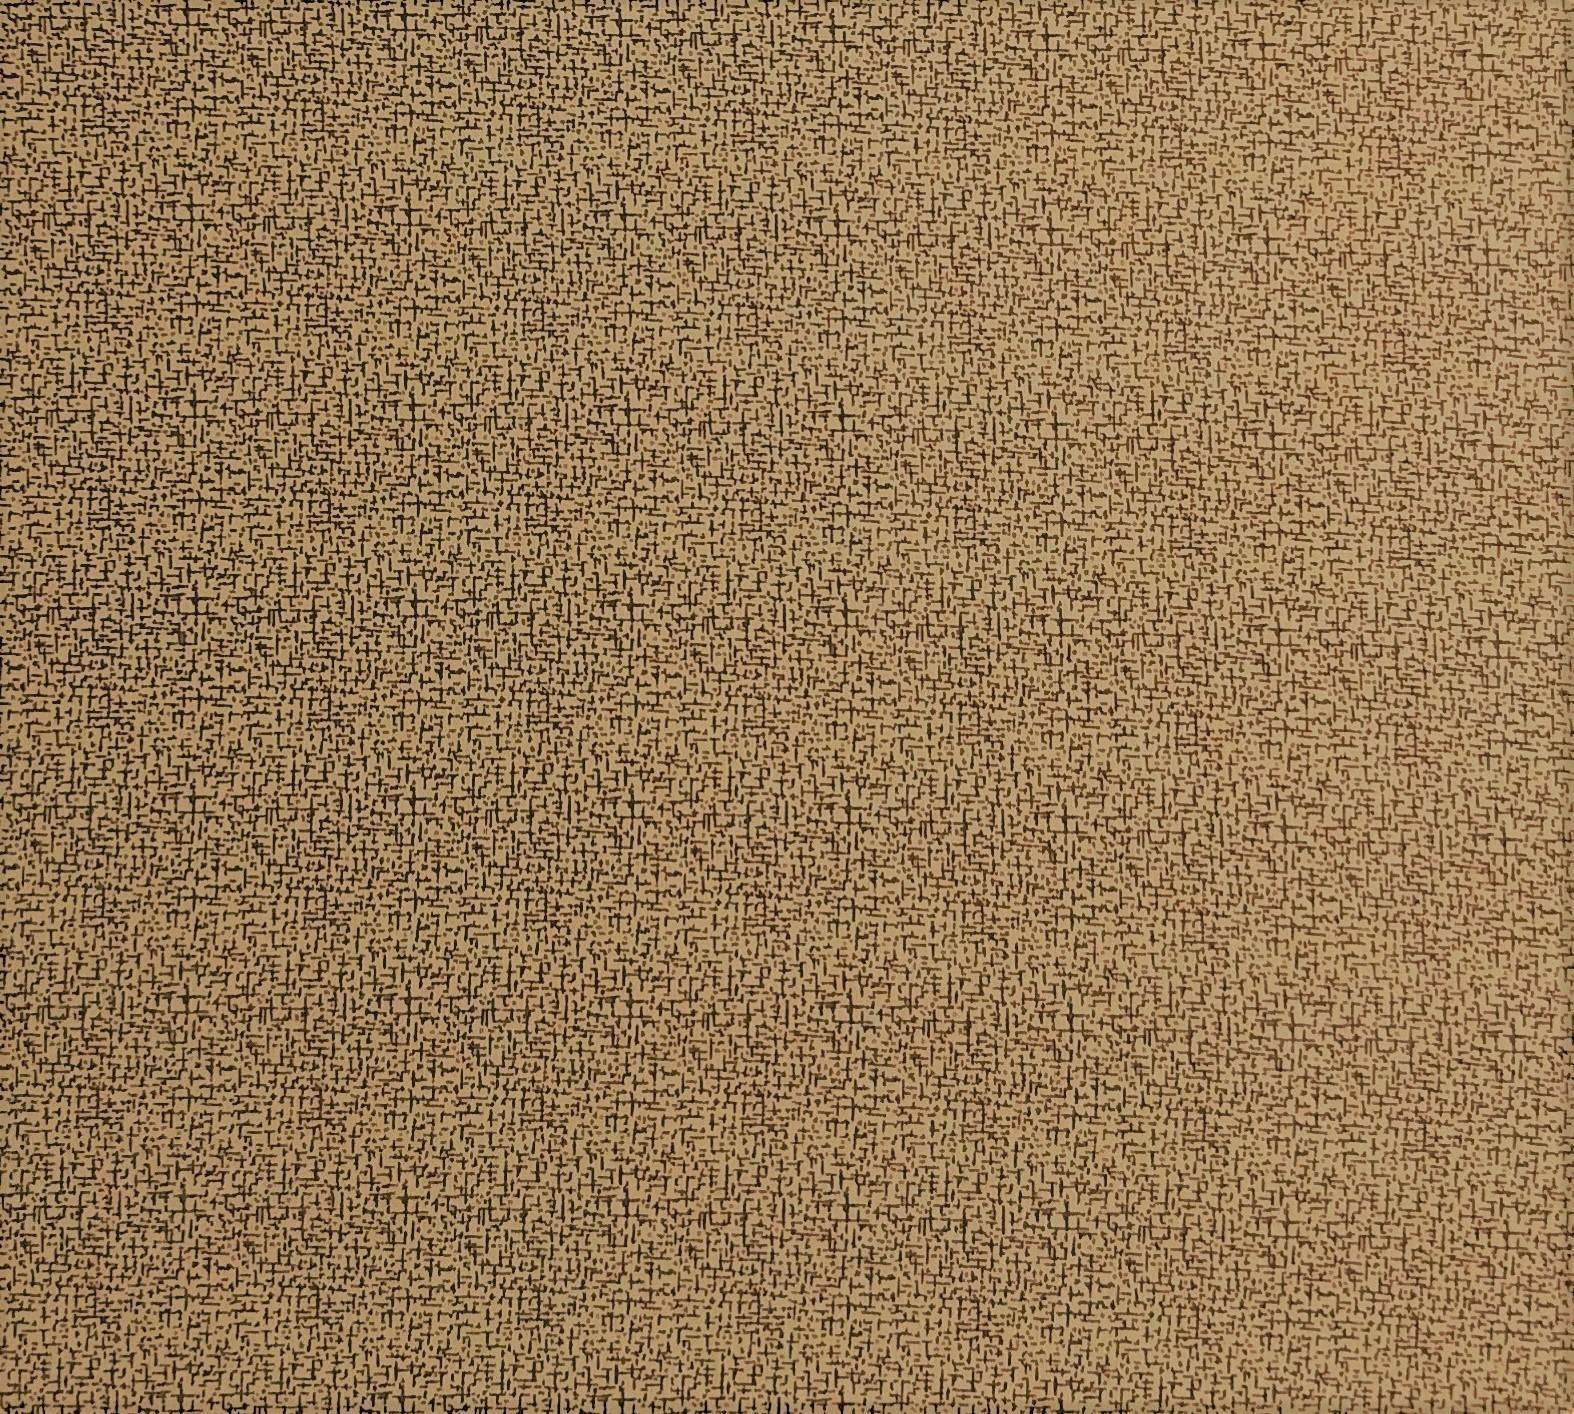 Craquelad cor - 10 (bege escuro) Ref. 180596 cor 10 Caldeira - Armarinhos Nodari